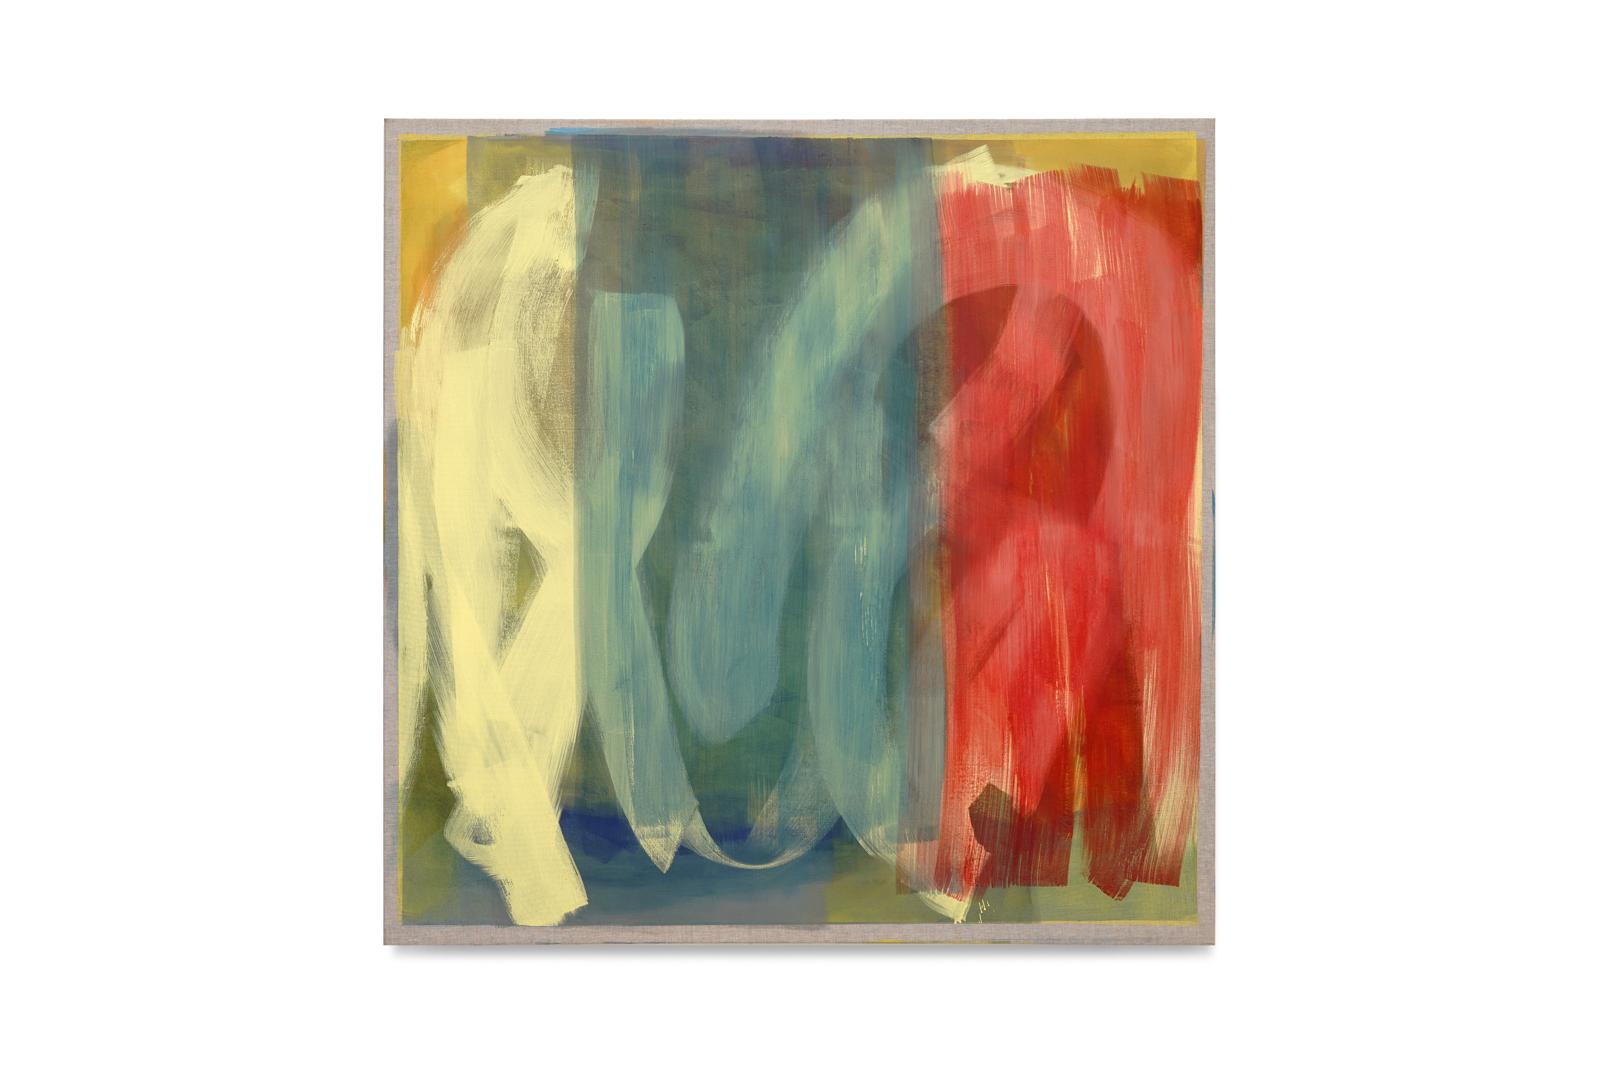 gelb blau rot, 2020, 140x140 | giallo blu rosso, 140x140